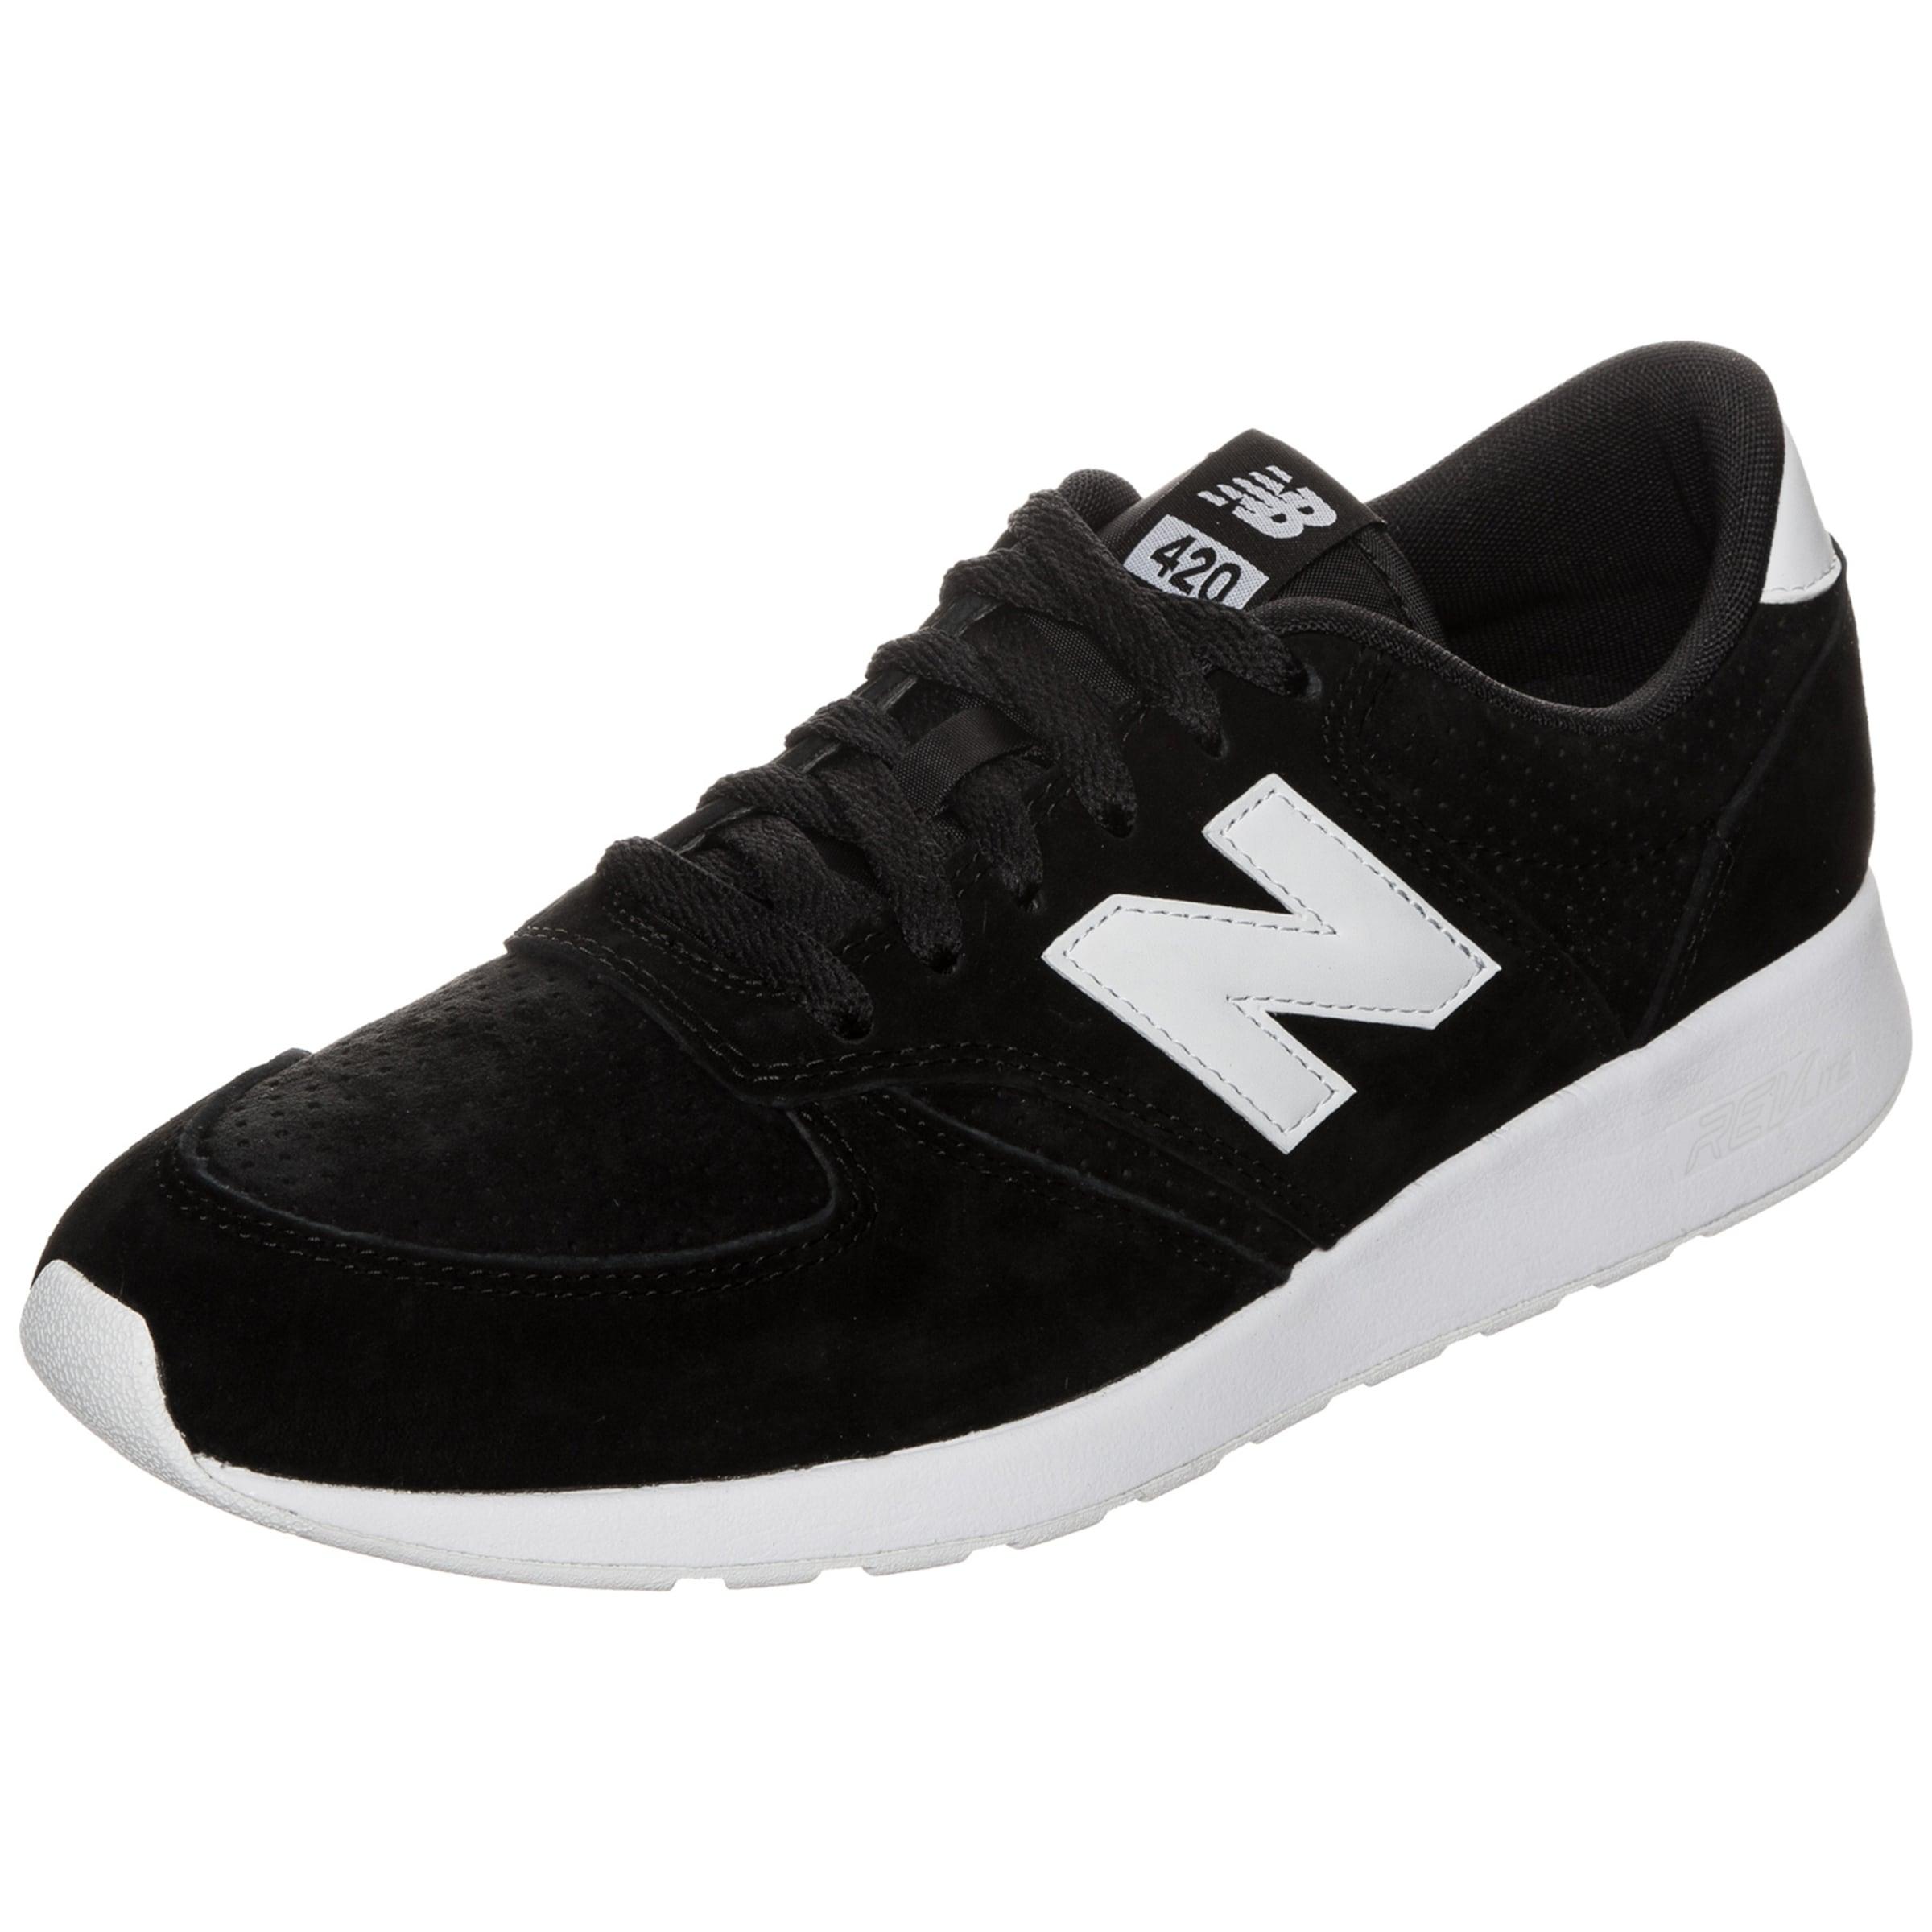 new balance MRL420-SN-D Sneaker Günstige Günstige Sneaker und langlebige Schuhe 90d197